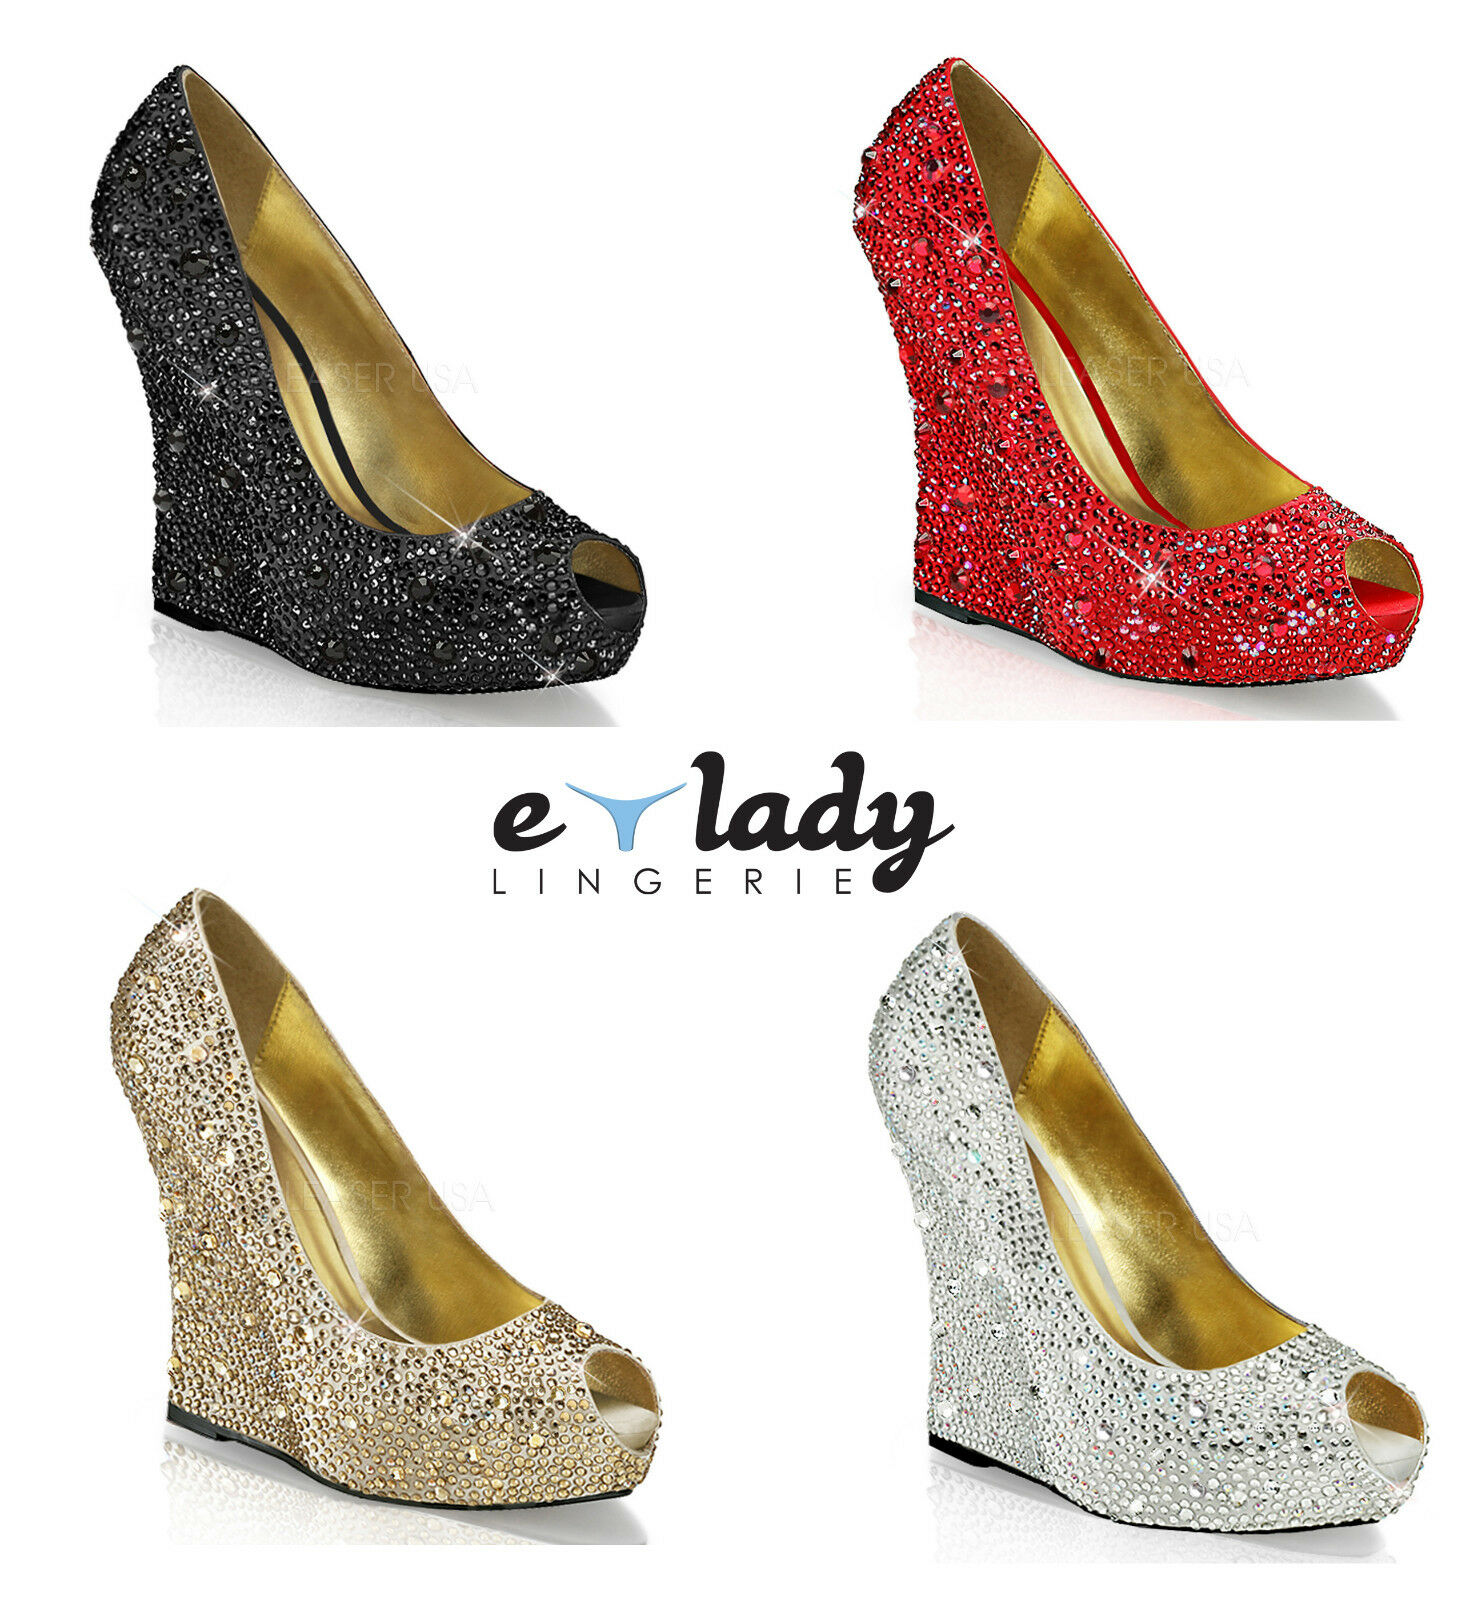 Pleaser Isabelle-18 Wedges schuhe Platform High Heels Peep Toes Diamantes Party